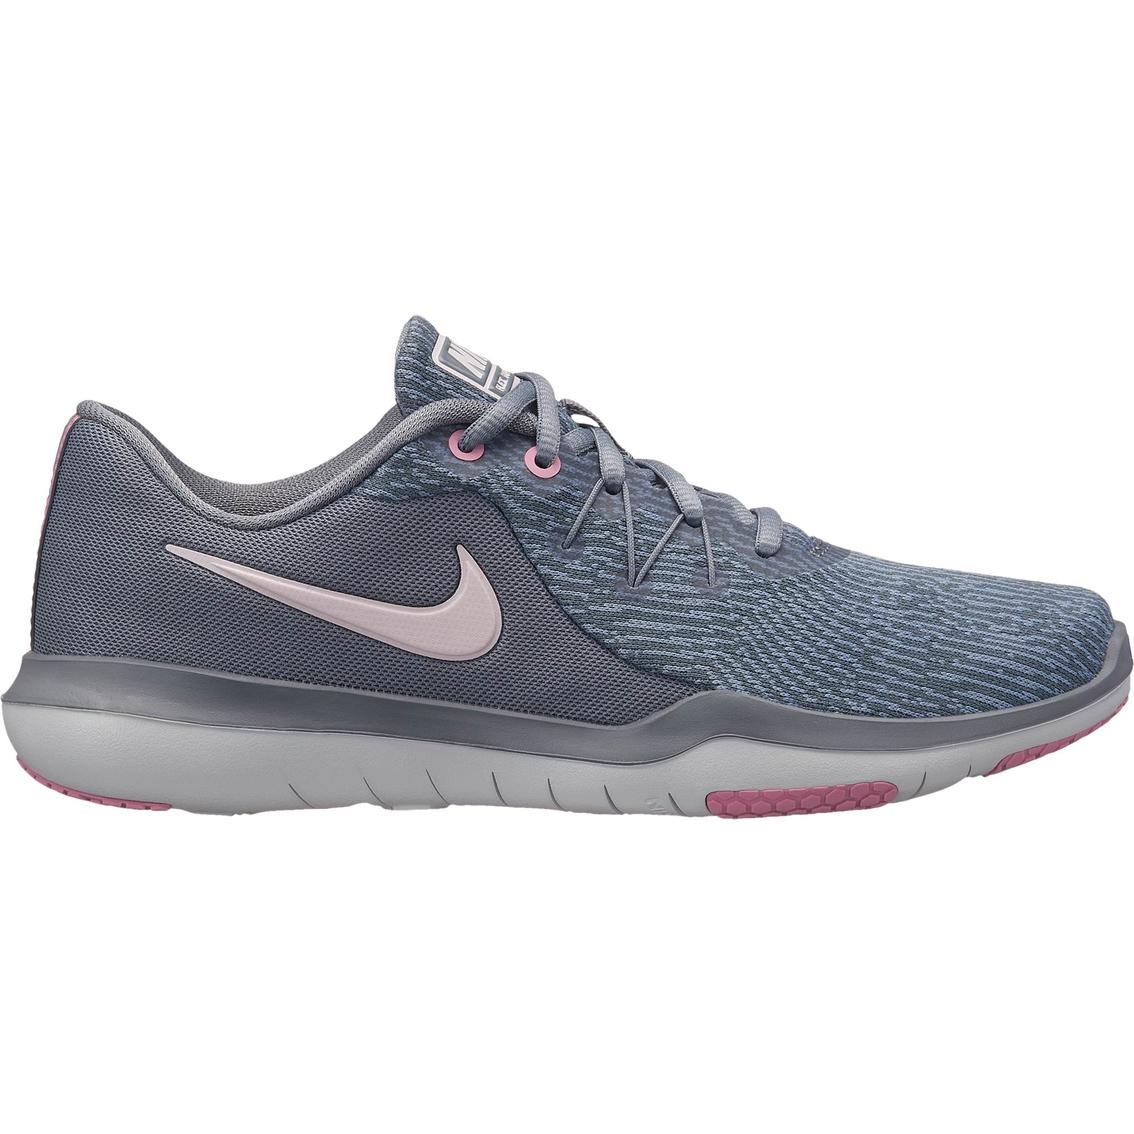 best website 1796d b707d Nike Womens Flex Supreme Training 6 Shoes